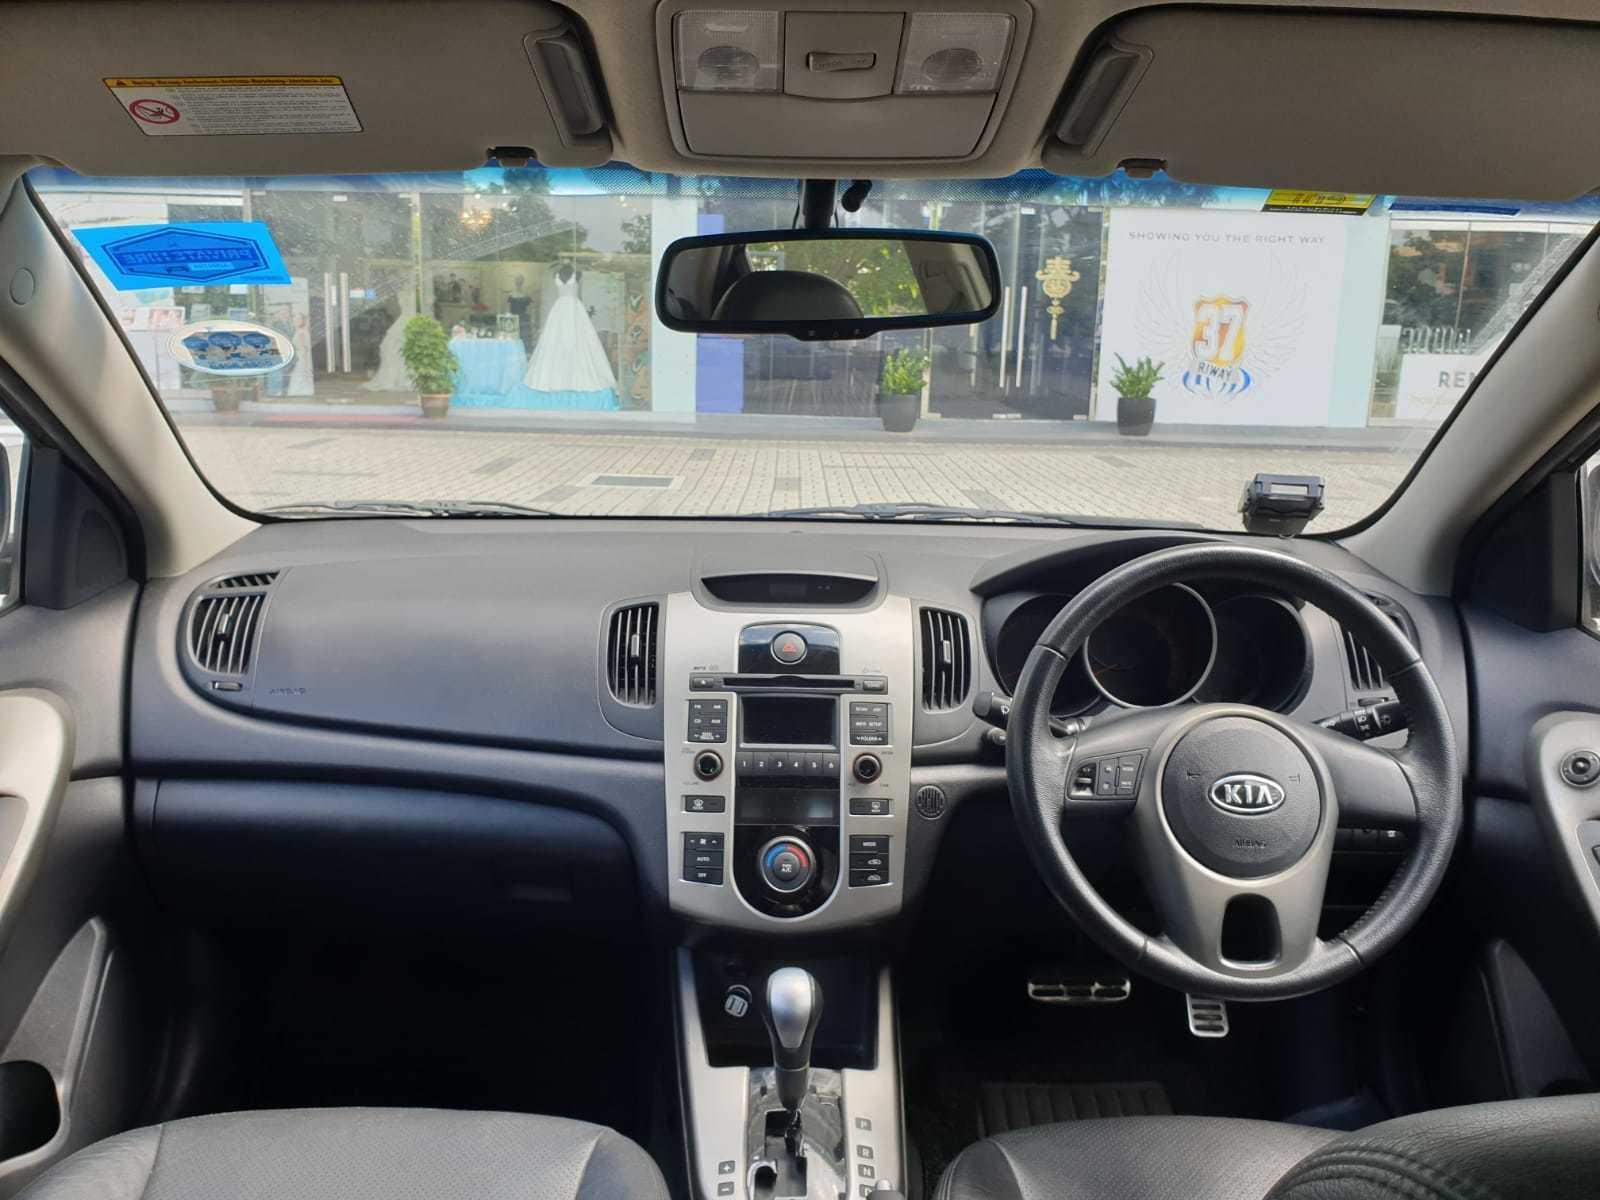 Kia Cerato Forte 1.6A @ Lowest rental rates, good condition!